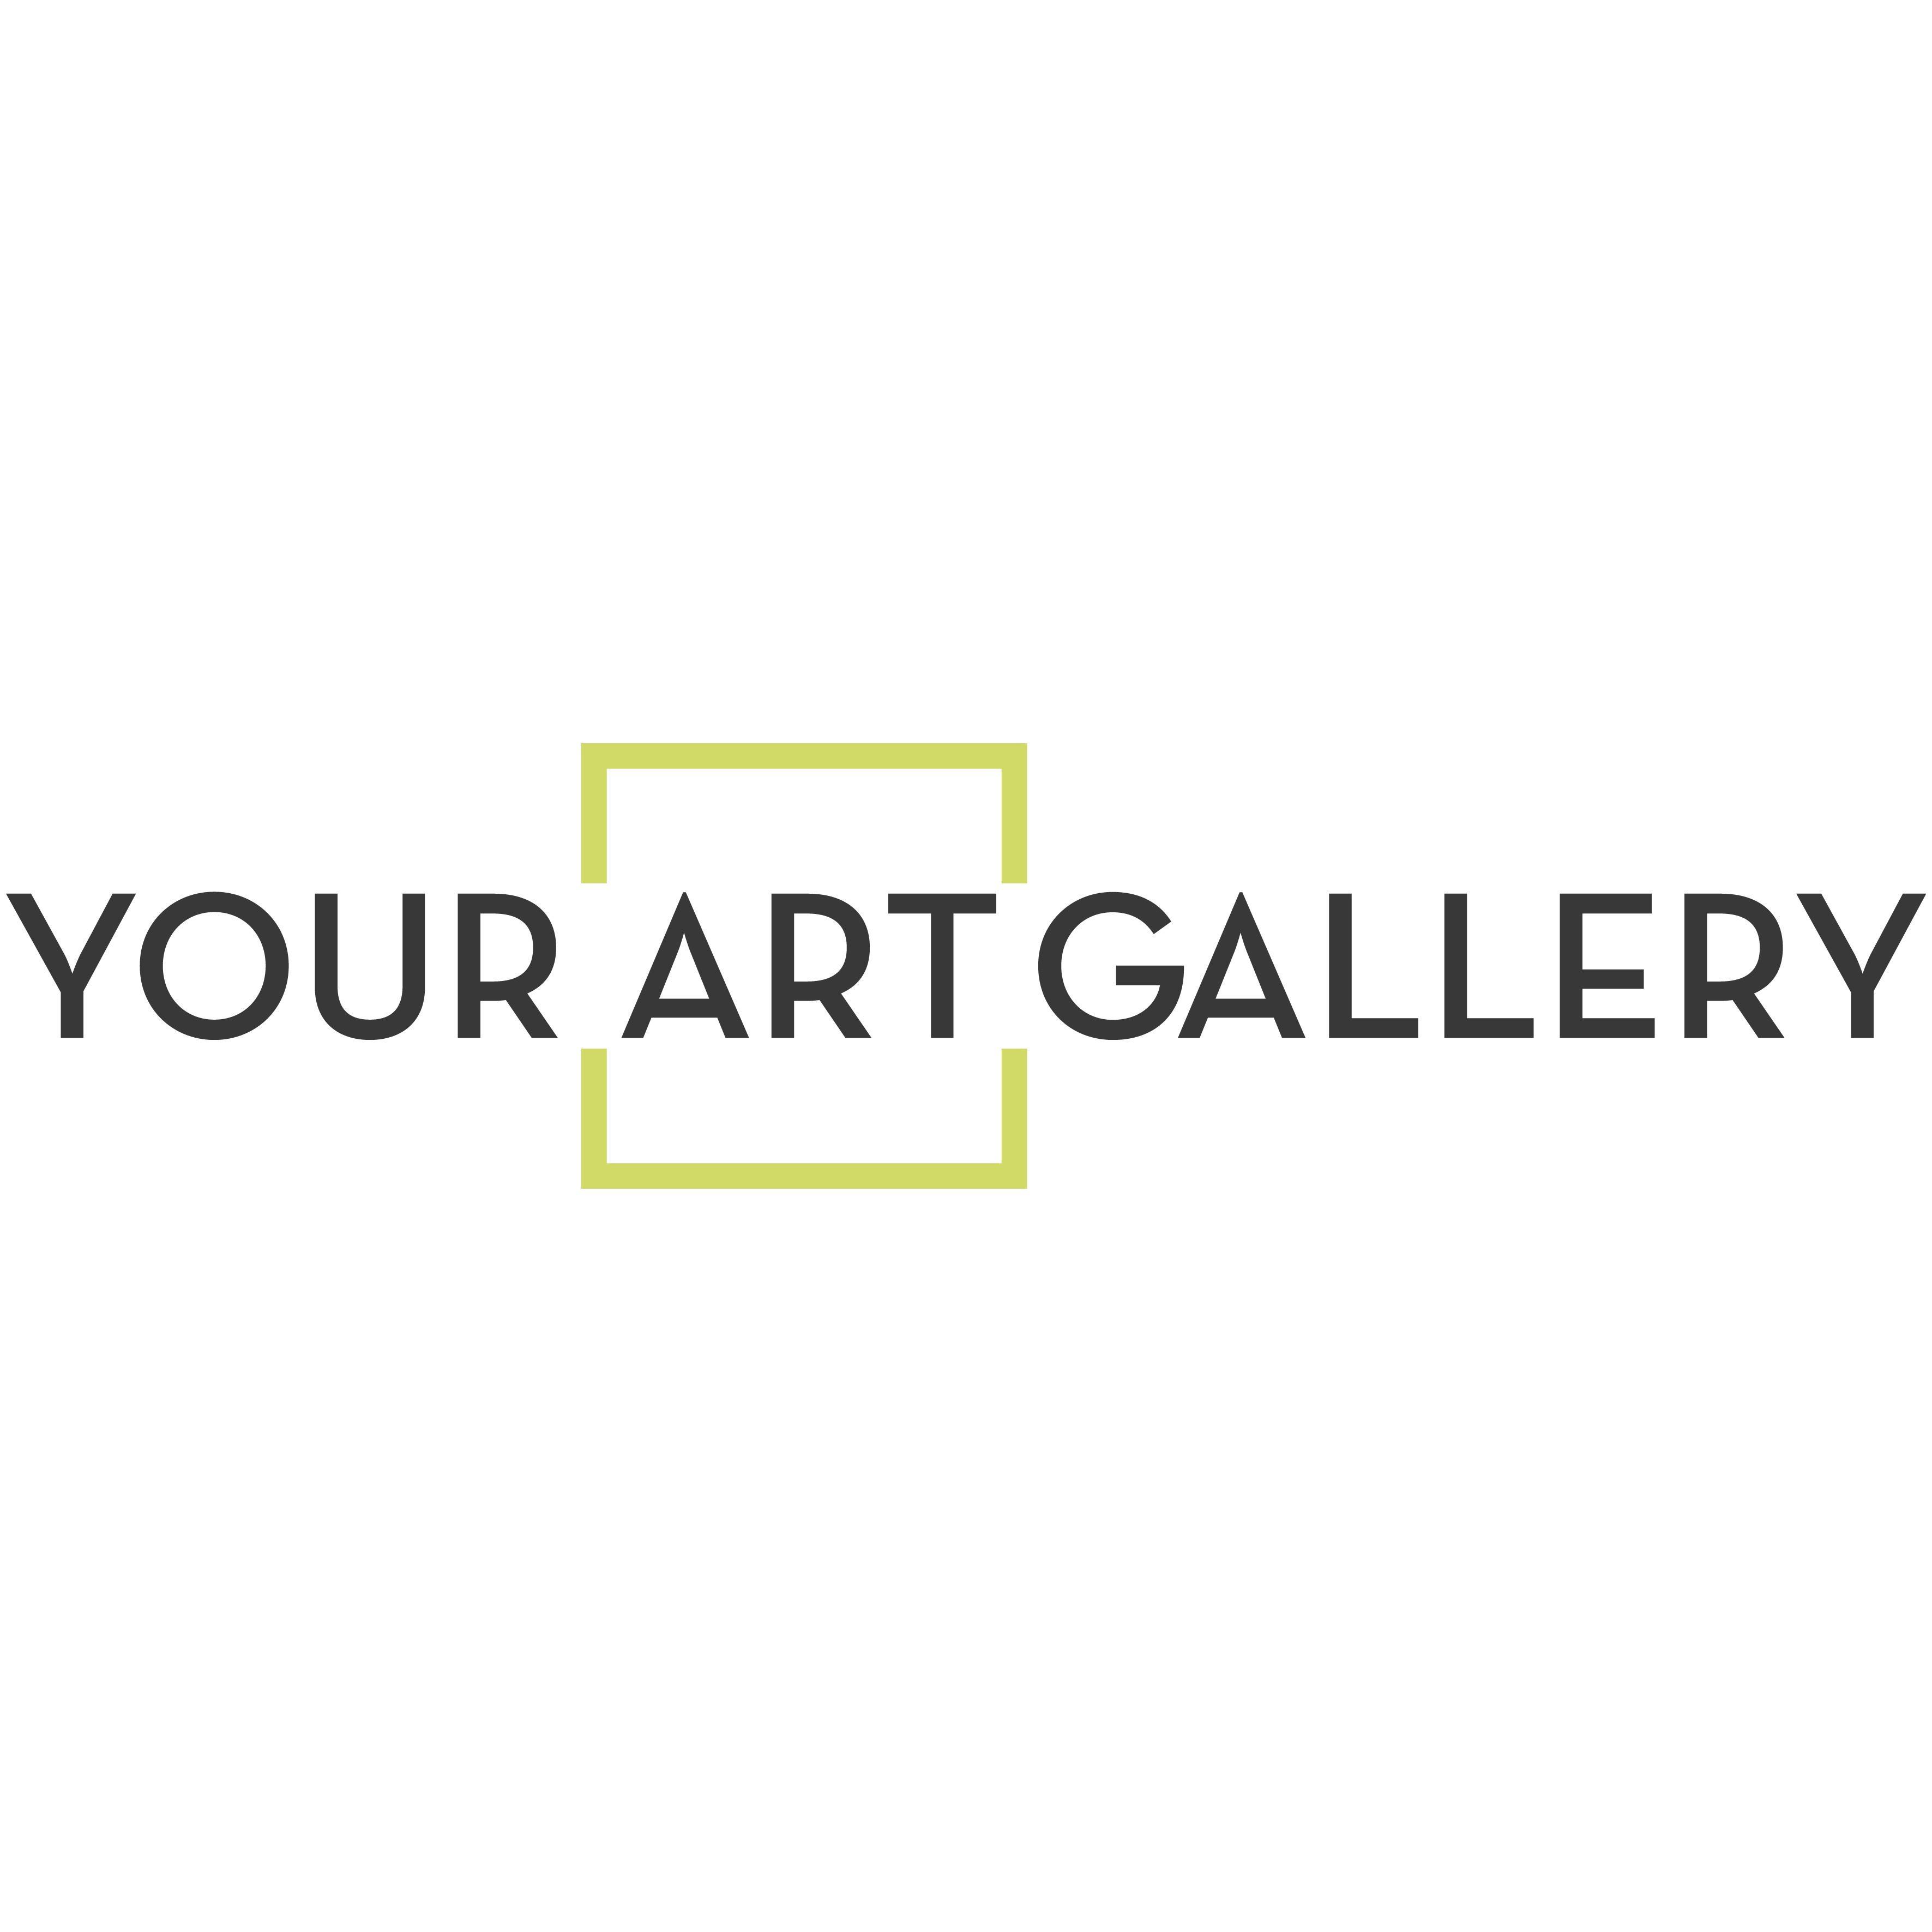 Your Art Gallery